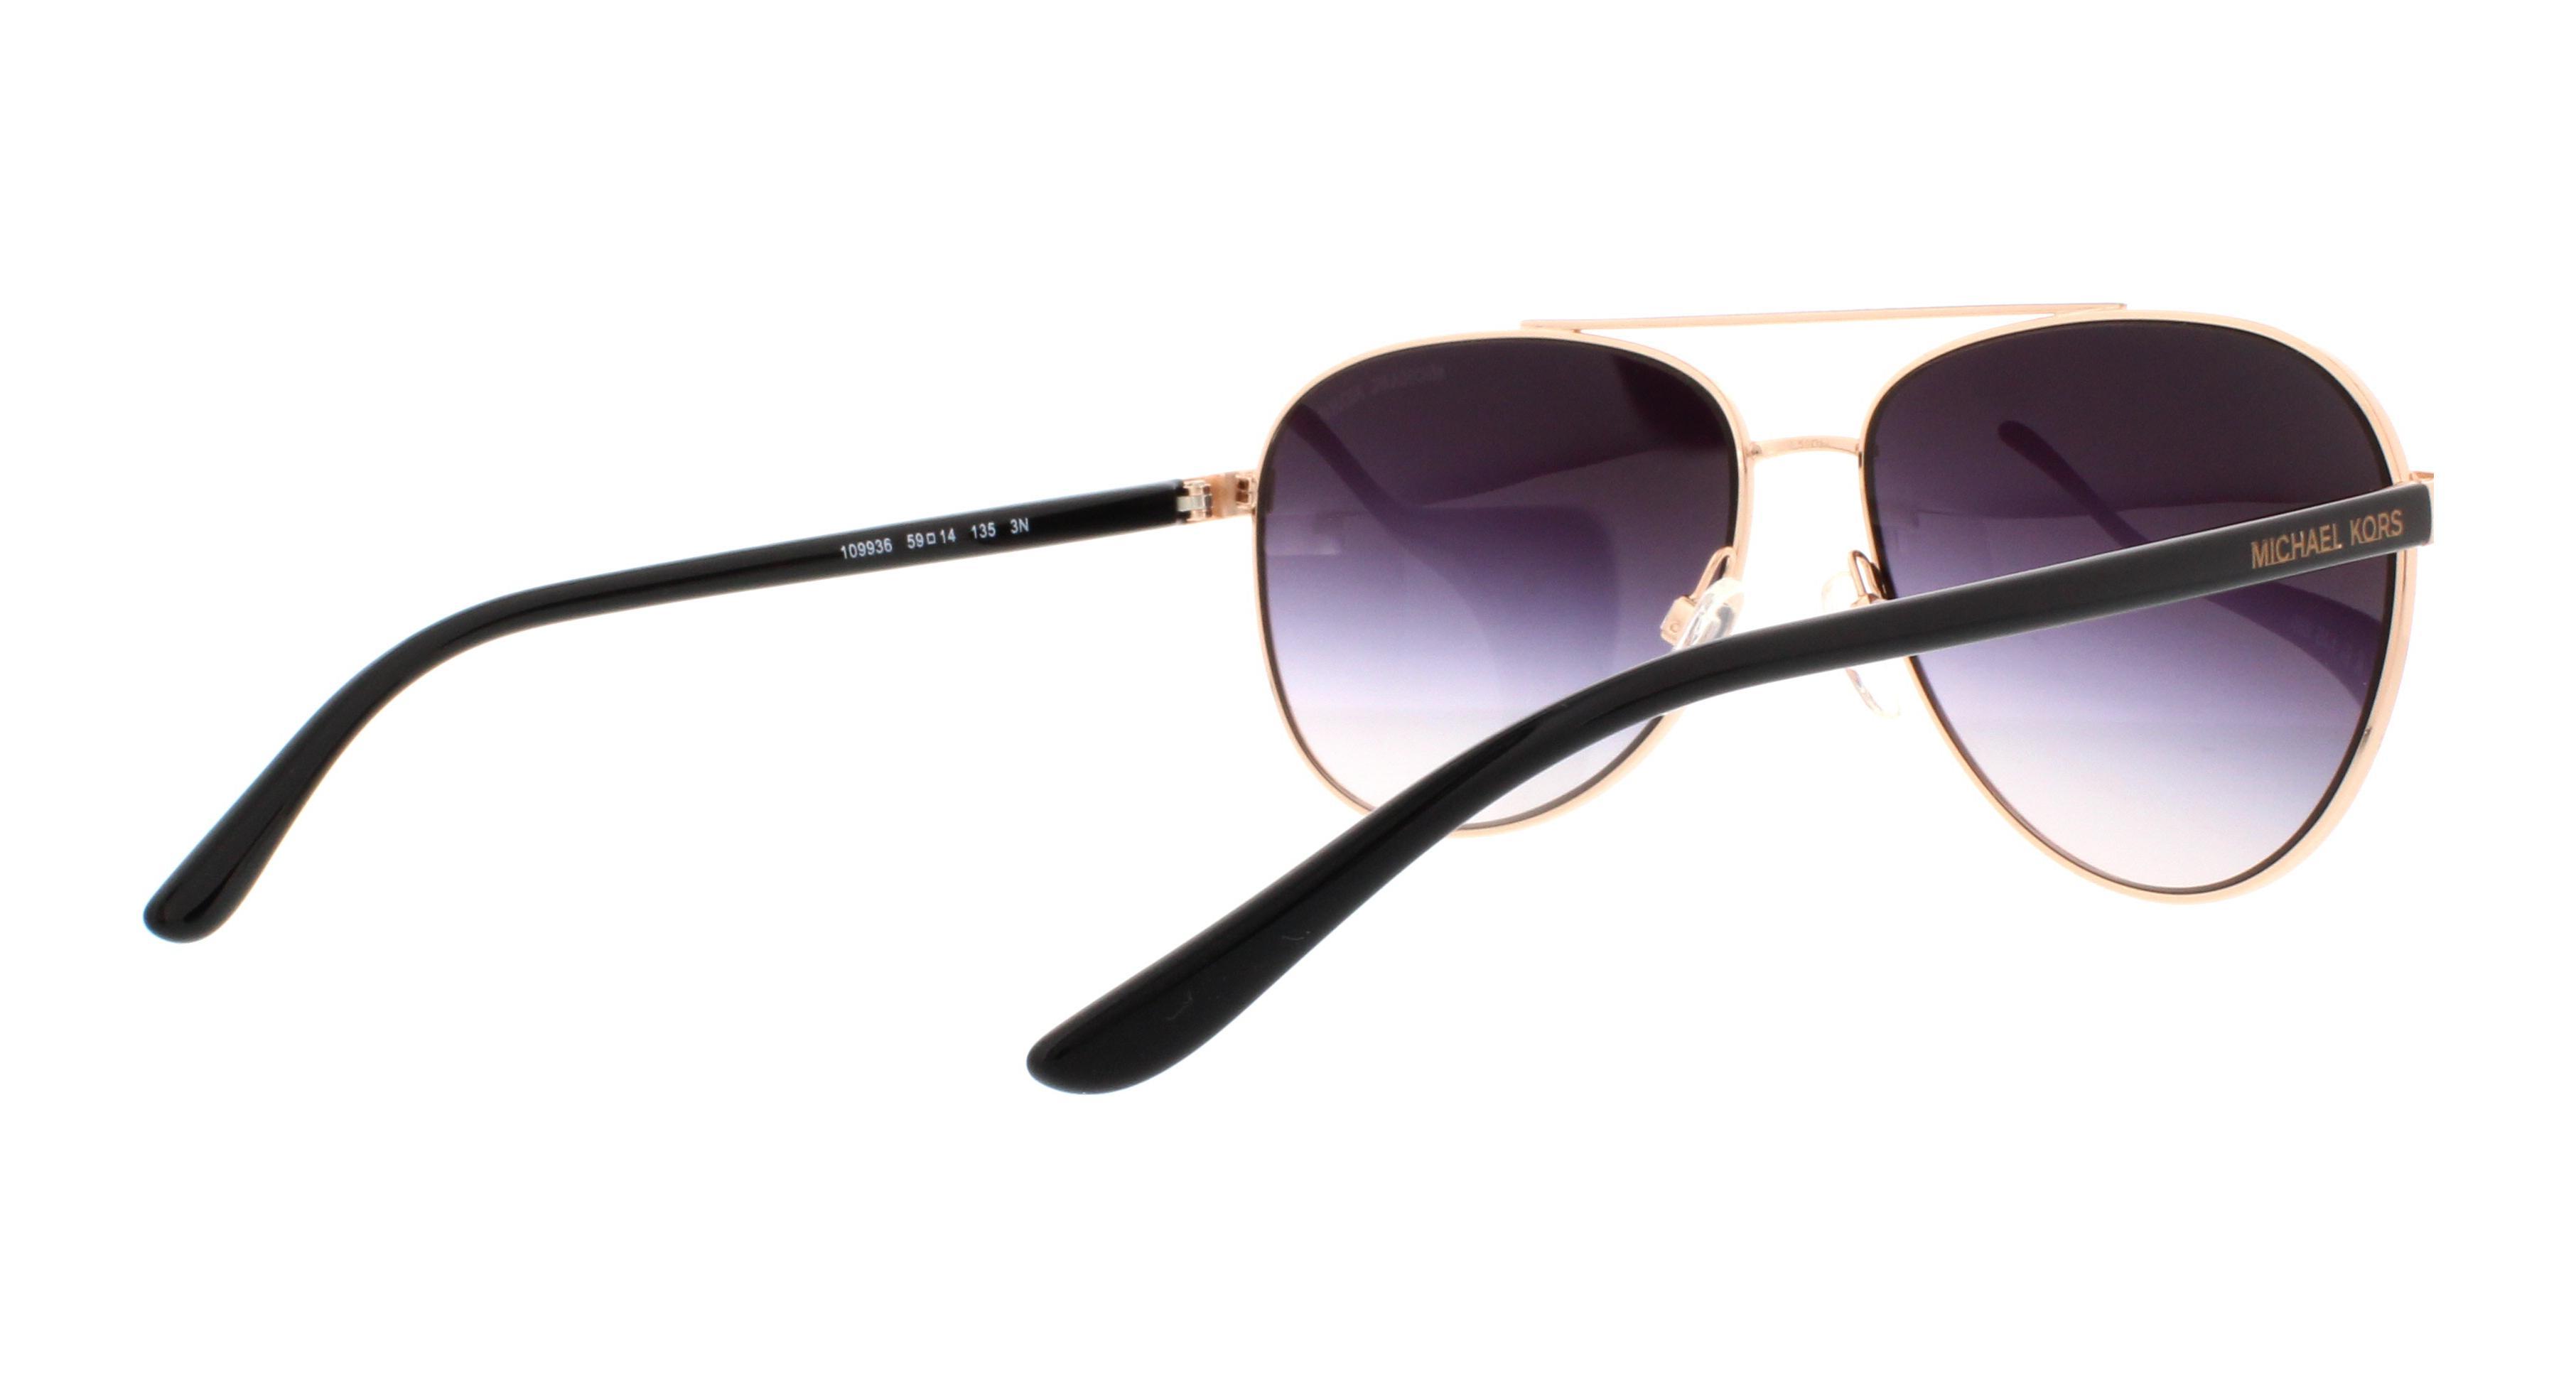 59fd43a6bb Michael Kors Hvar Sunglasses Rose Gold